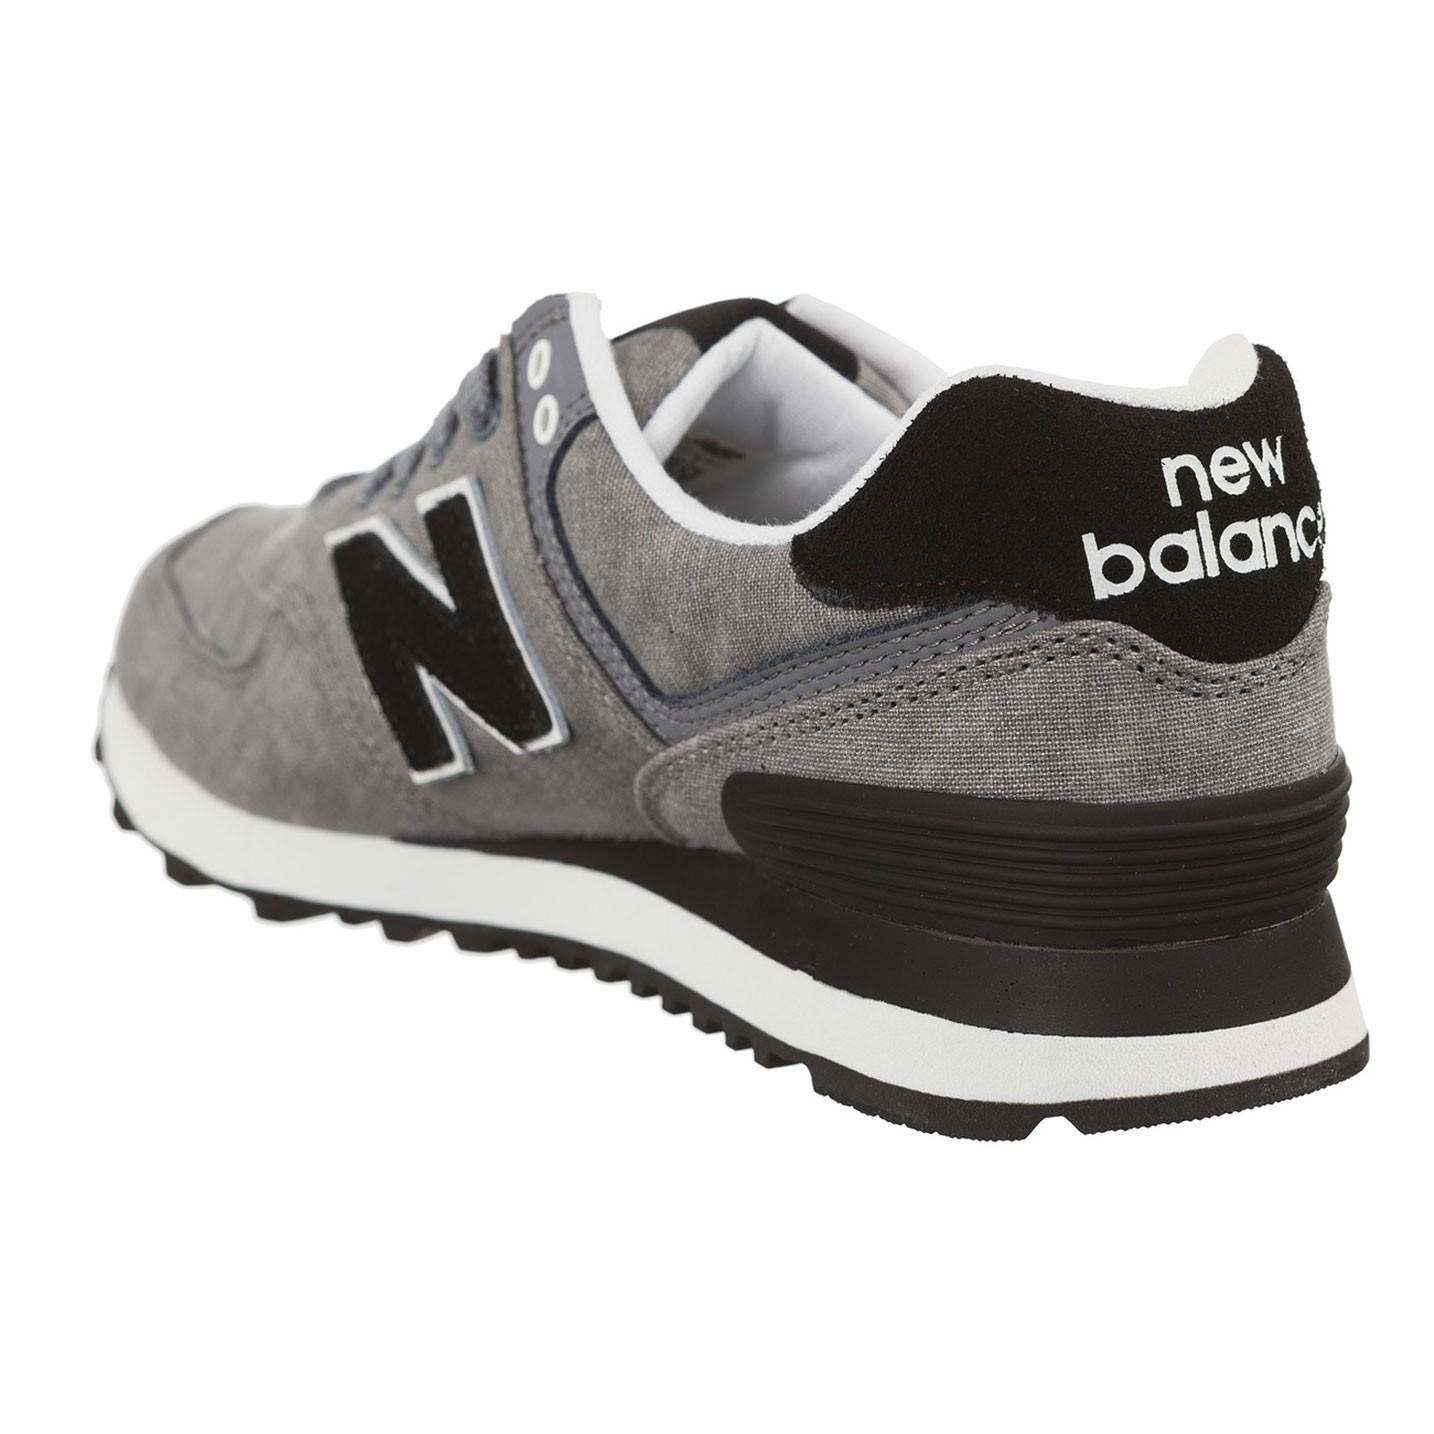 New Balance Wl574 swc  7a75657a398